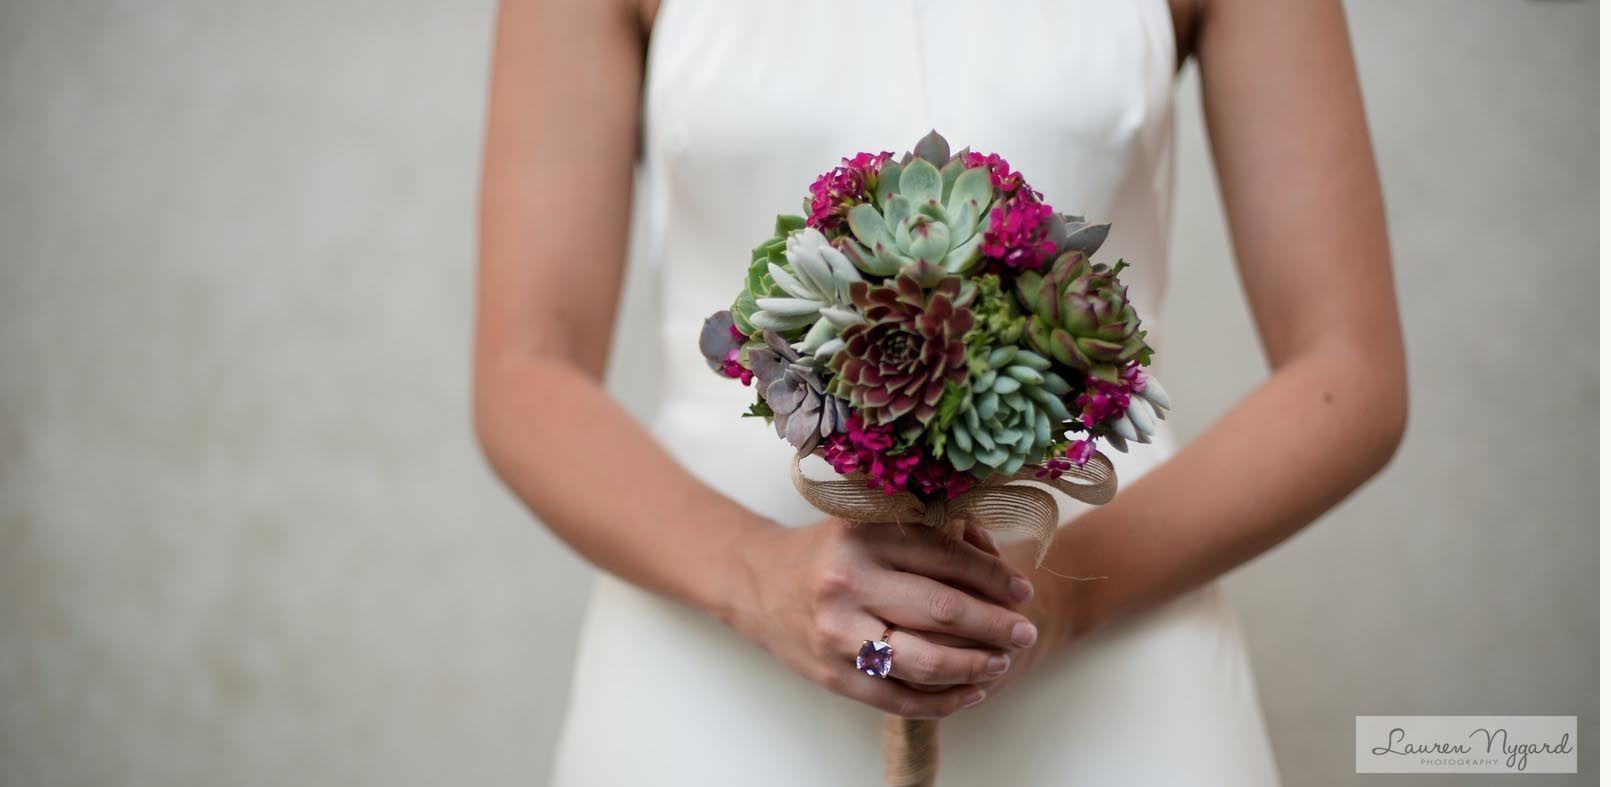 17 alternative wedding bouquets for brides that think flowers are a 17 alternative wedding bouquets for brides that think flowers are a bit meh izmirmasajfo